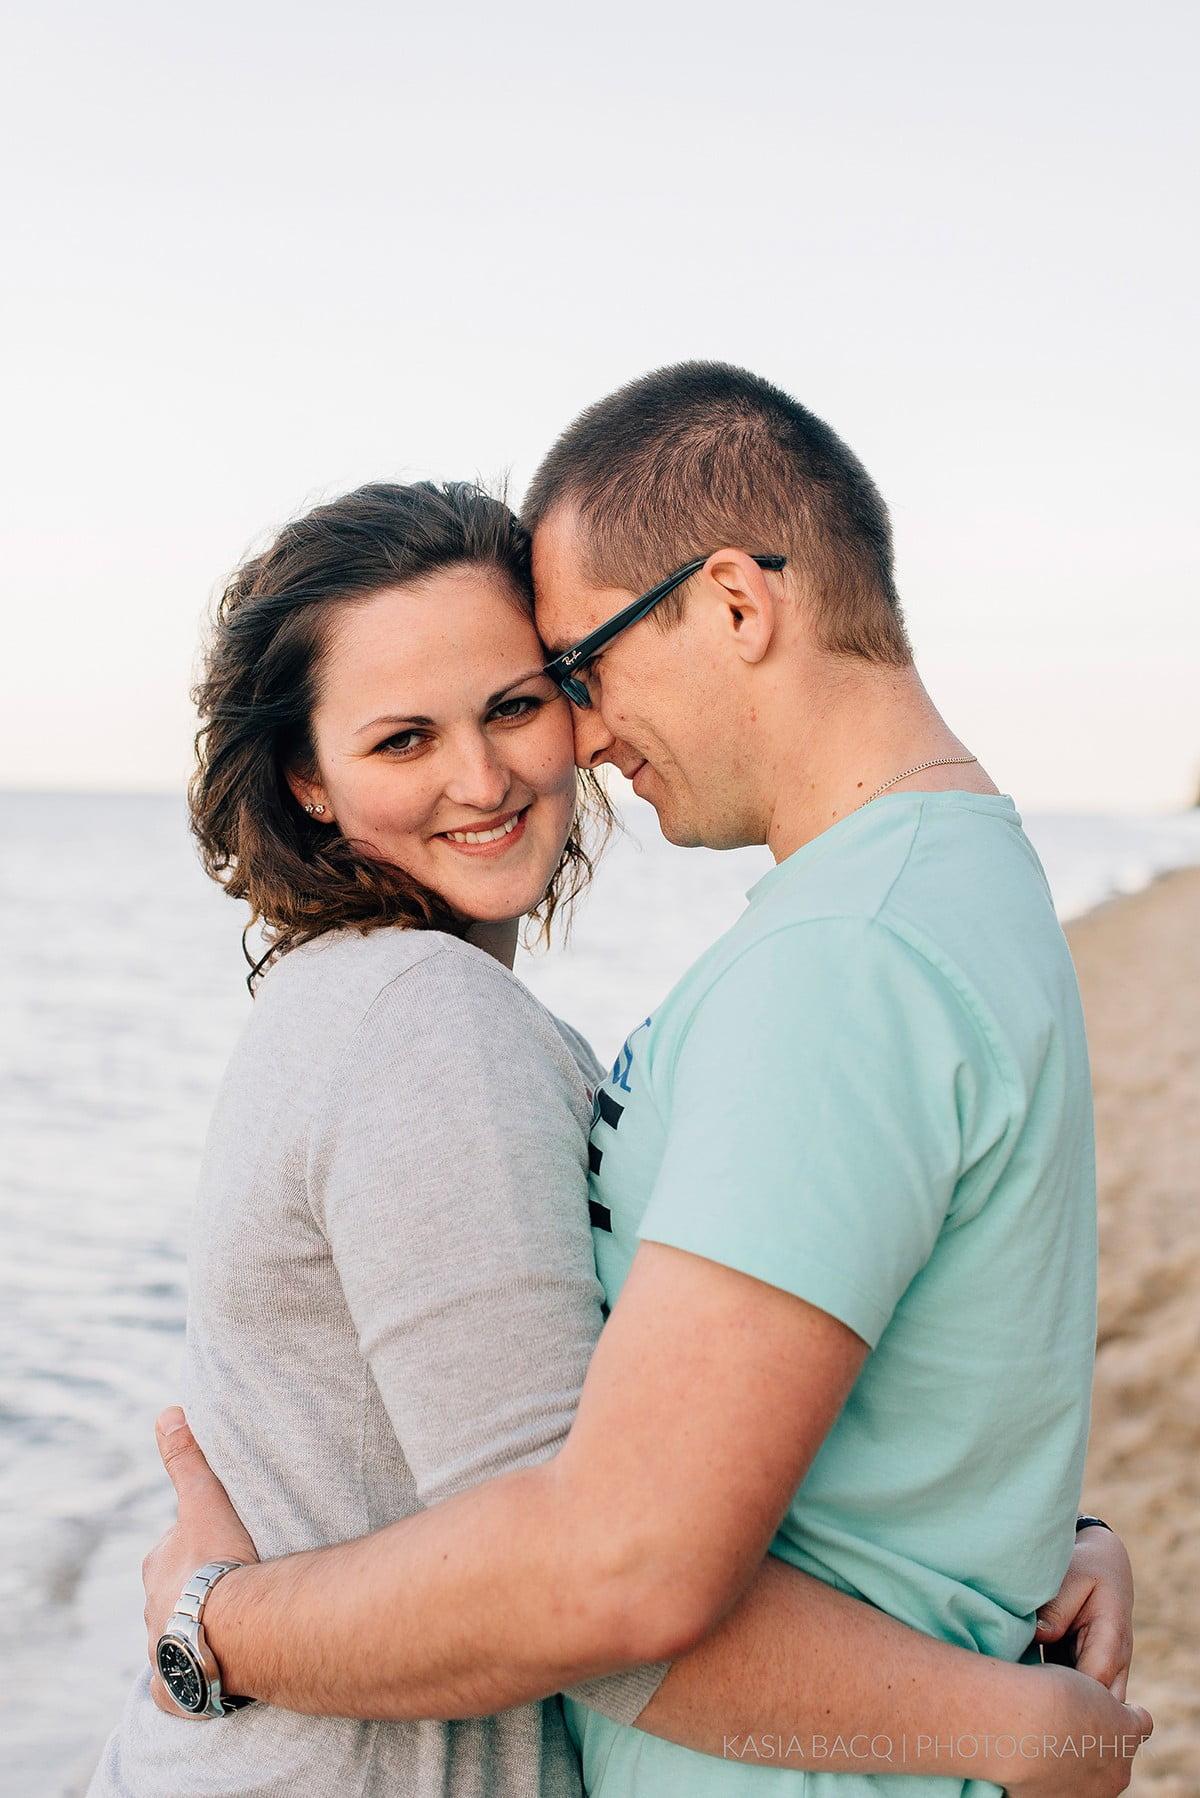 Family Shoot Beach Gdynia Kasia Bacq-03